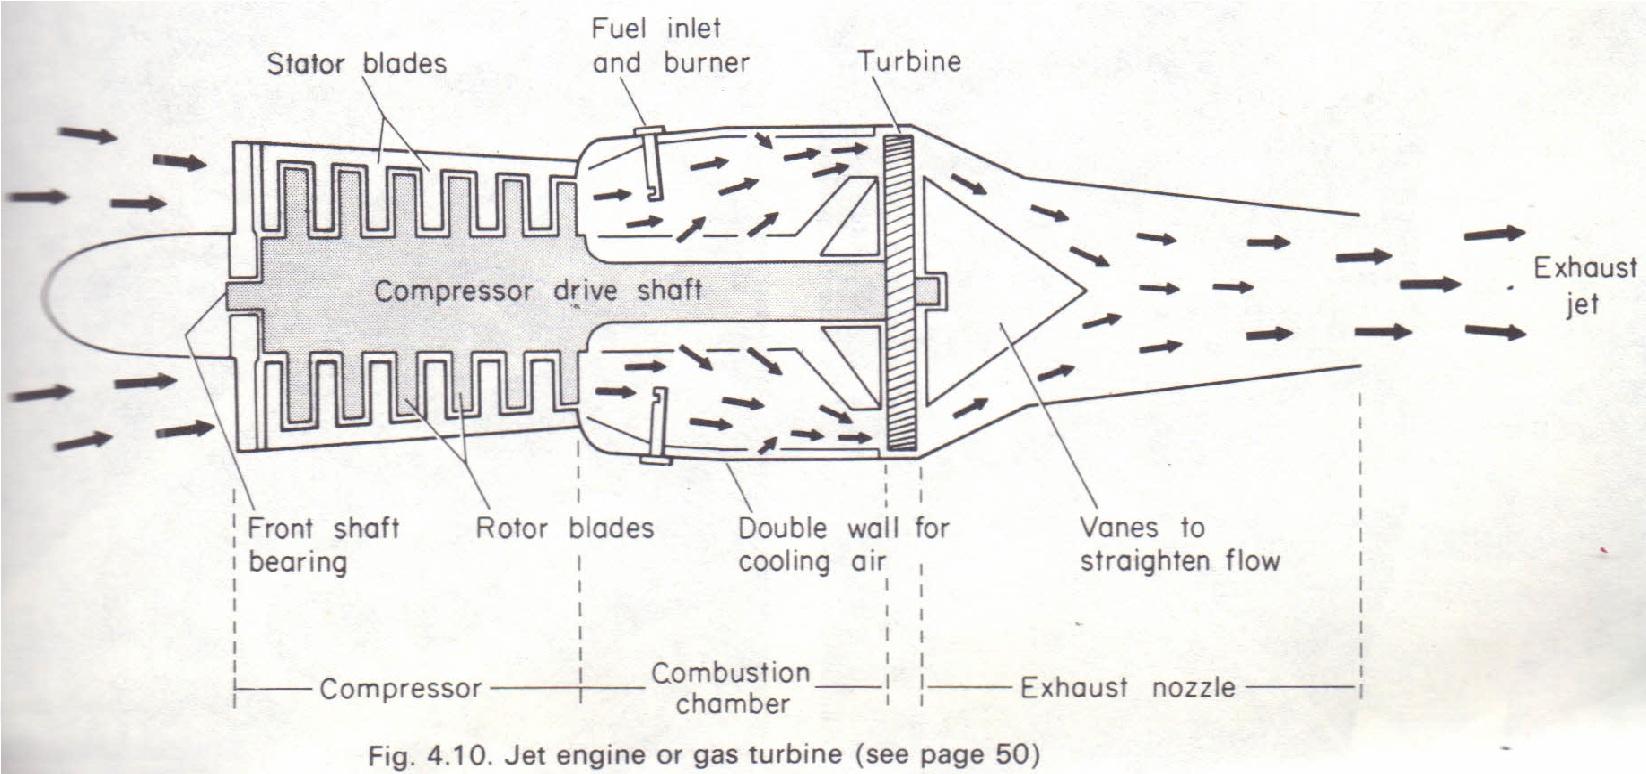 rocket propulsion physics homework help physics assignments and  rocket propulsion